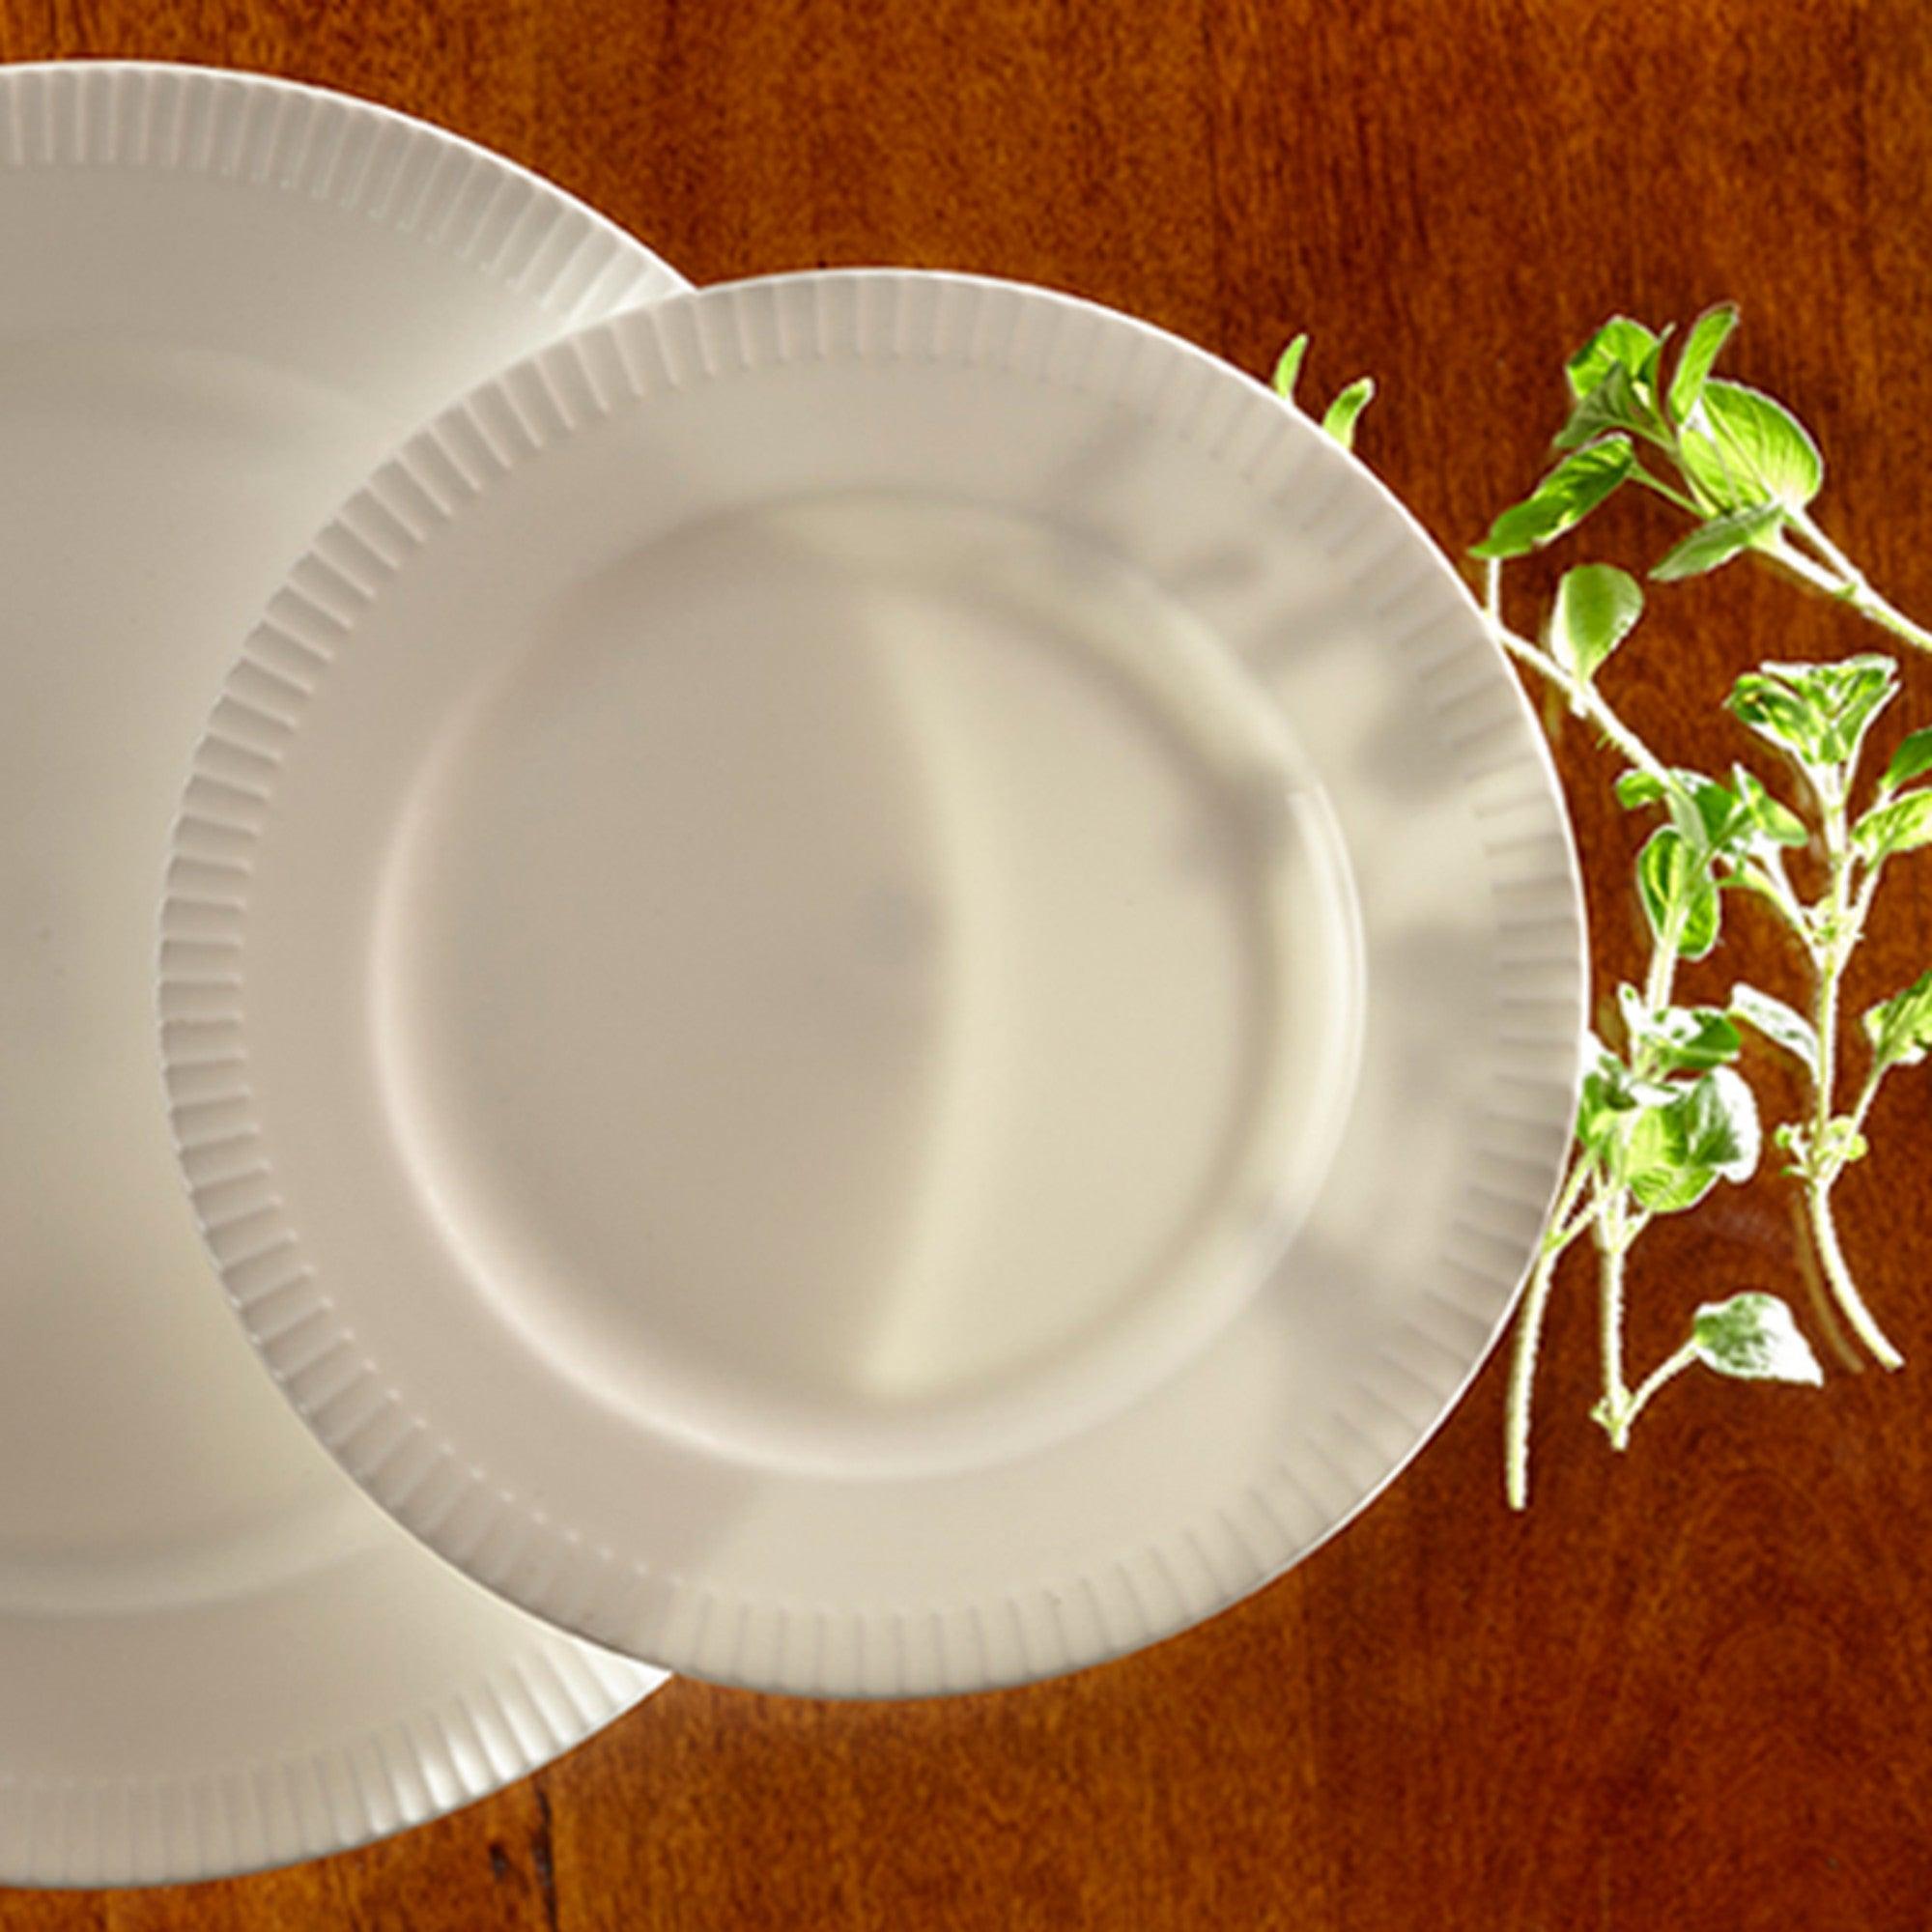 Surprising Roscher Dinnerware Contemporary - Best Image Engine . & Surprising Roscher Dinnerware Contemporary - Best Image Engine ...